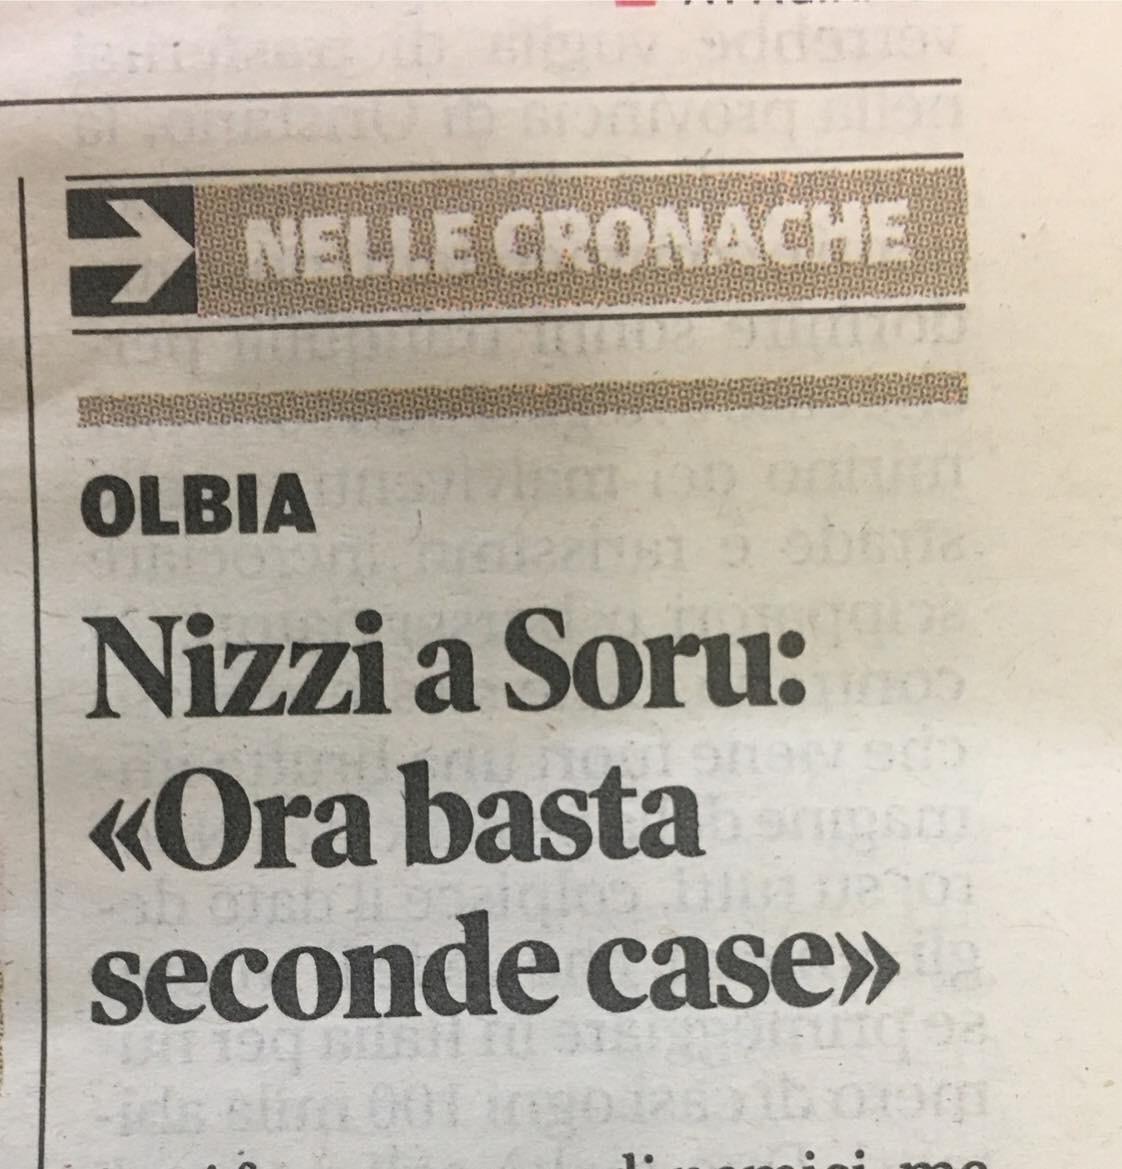 Nizzi, Soru e le seconde case (di Francesco Giorgioni)